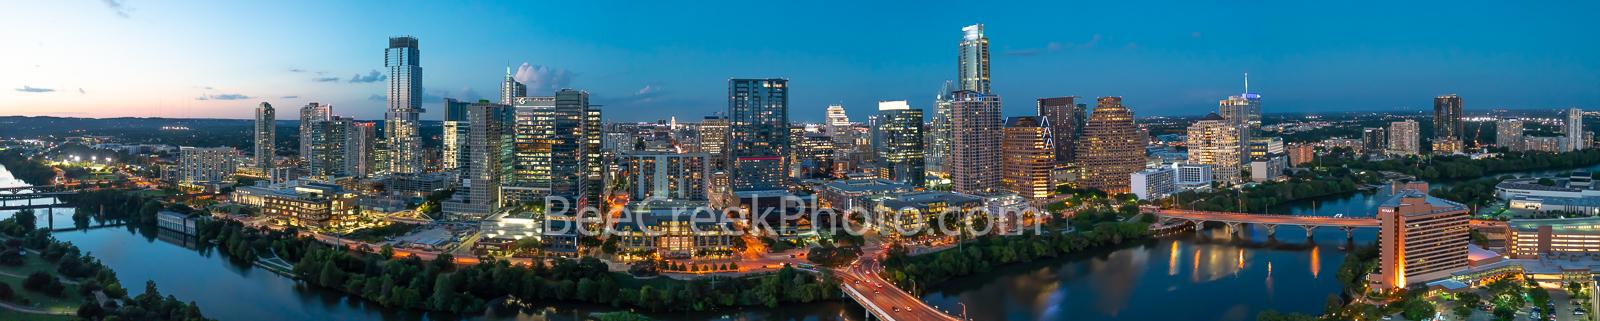 Austin skyline, Aerial, Skyline, Austin aerial skyline, cityscape, downtown, jingle, austonian, google, lady bird lake, town lake, vic mattis park, auditorium shores, first street bridge, pano, panora, photo